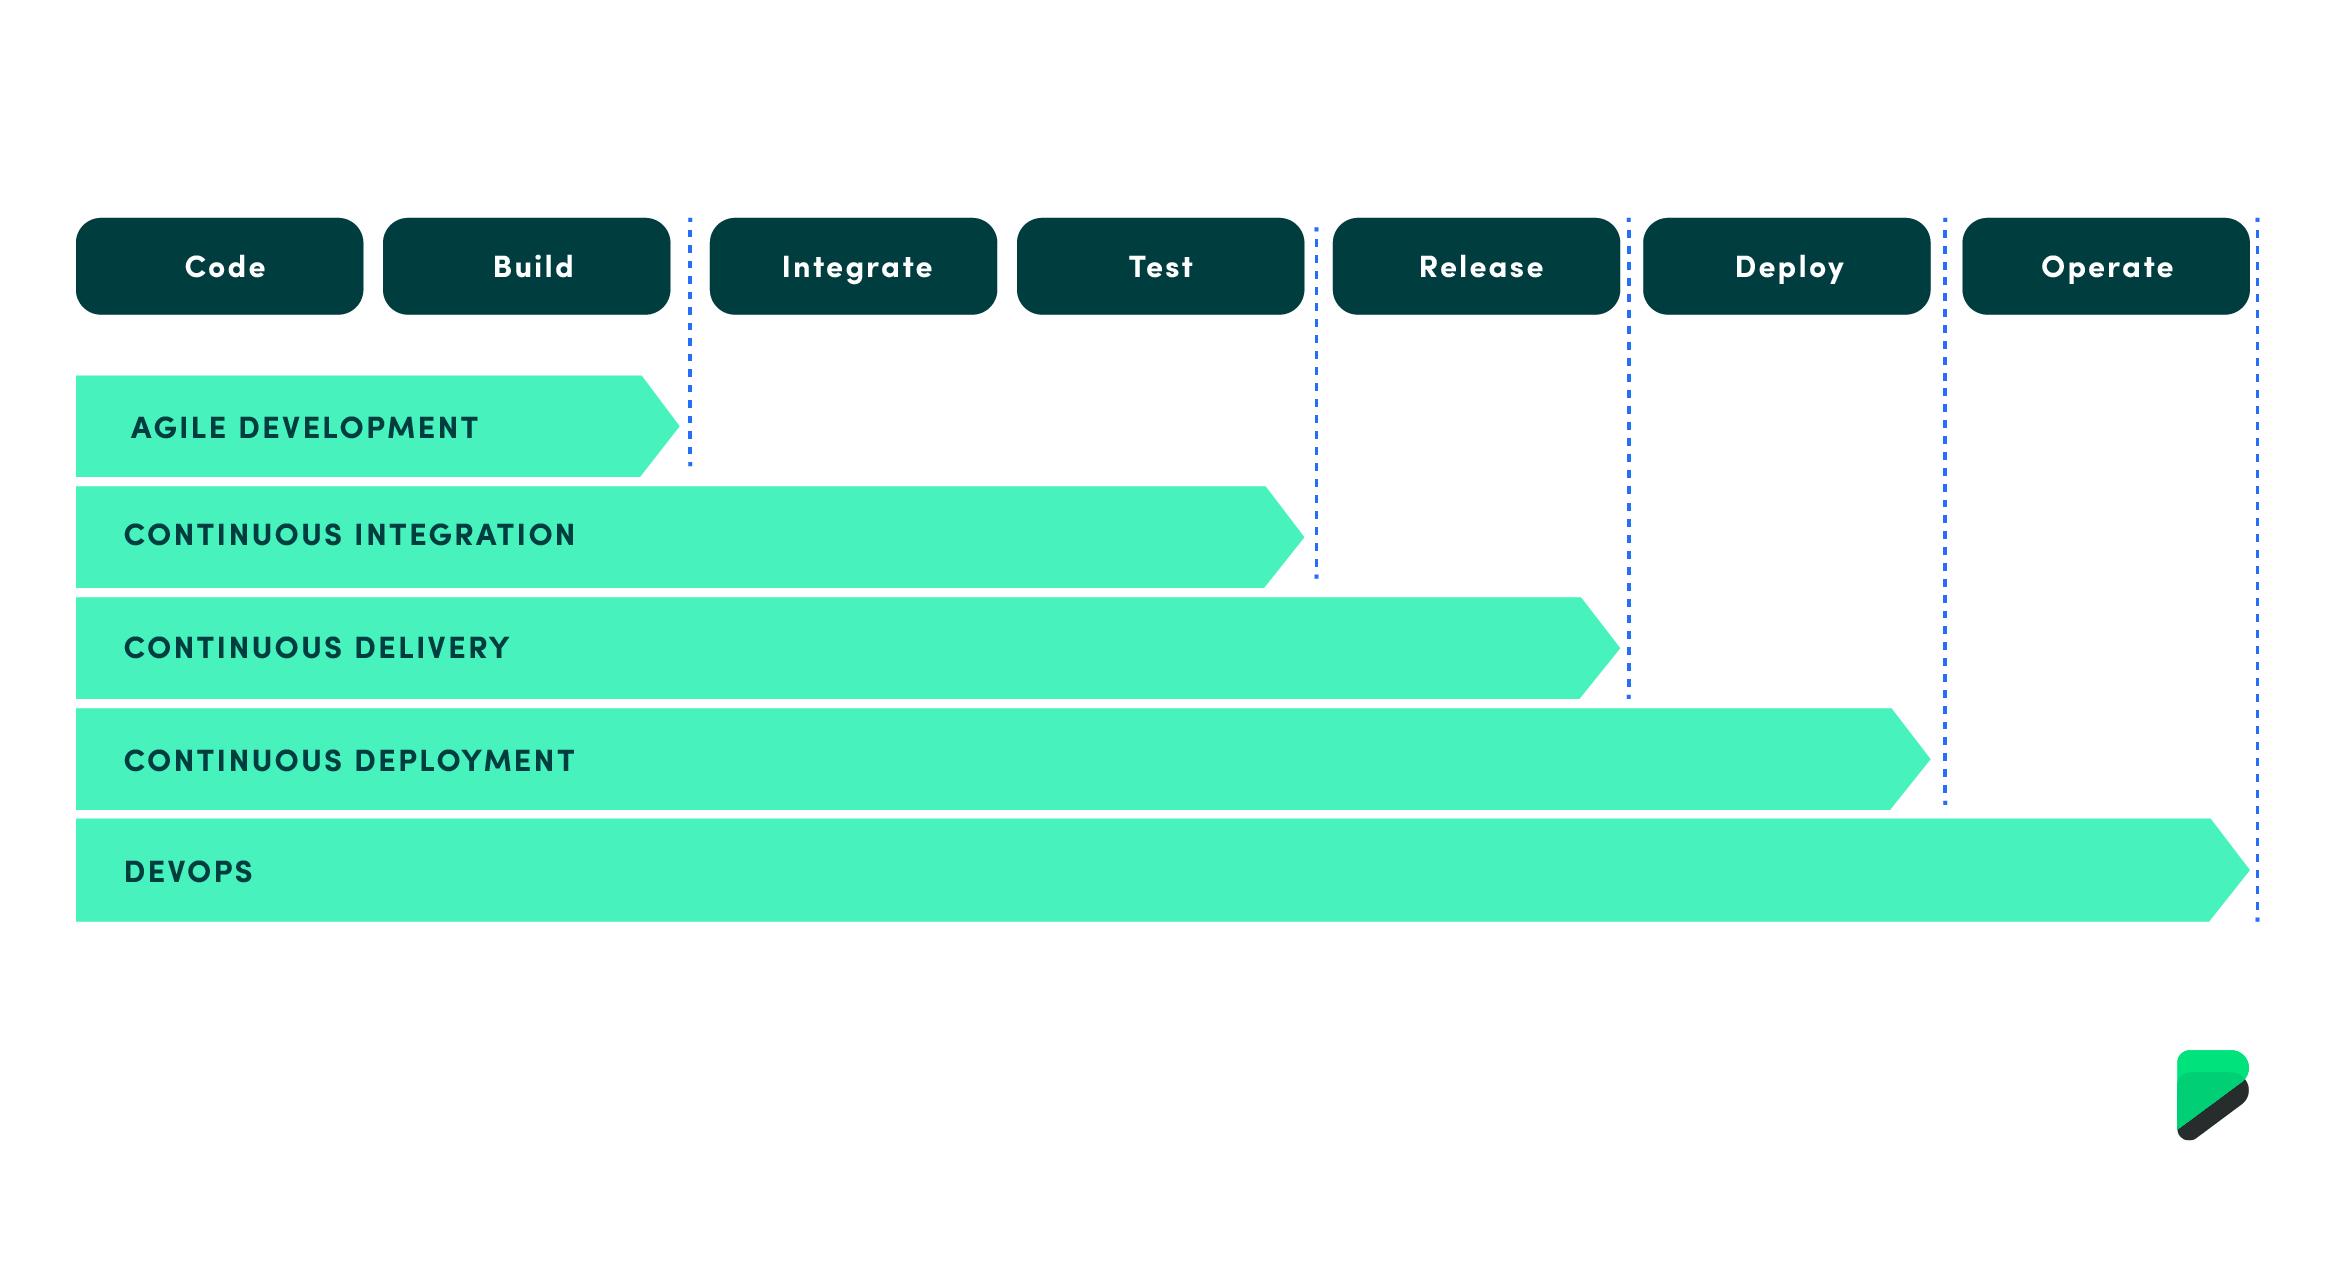 DevOps maturity model, showing how a company's roadmap of devops adoption looks like